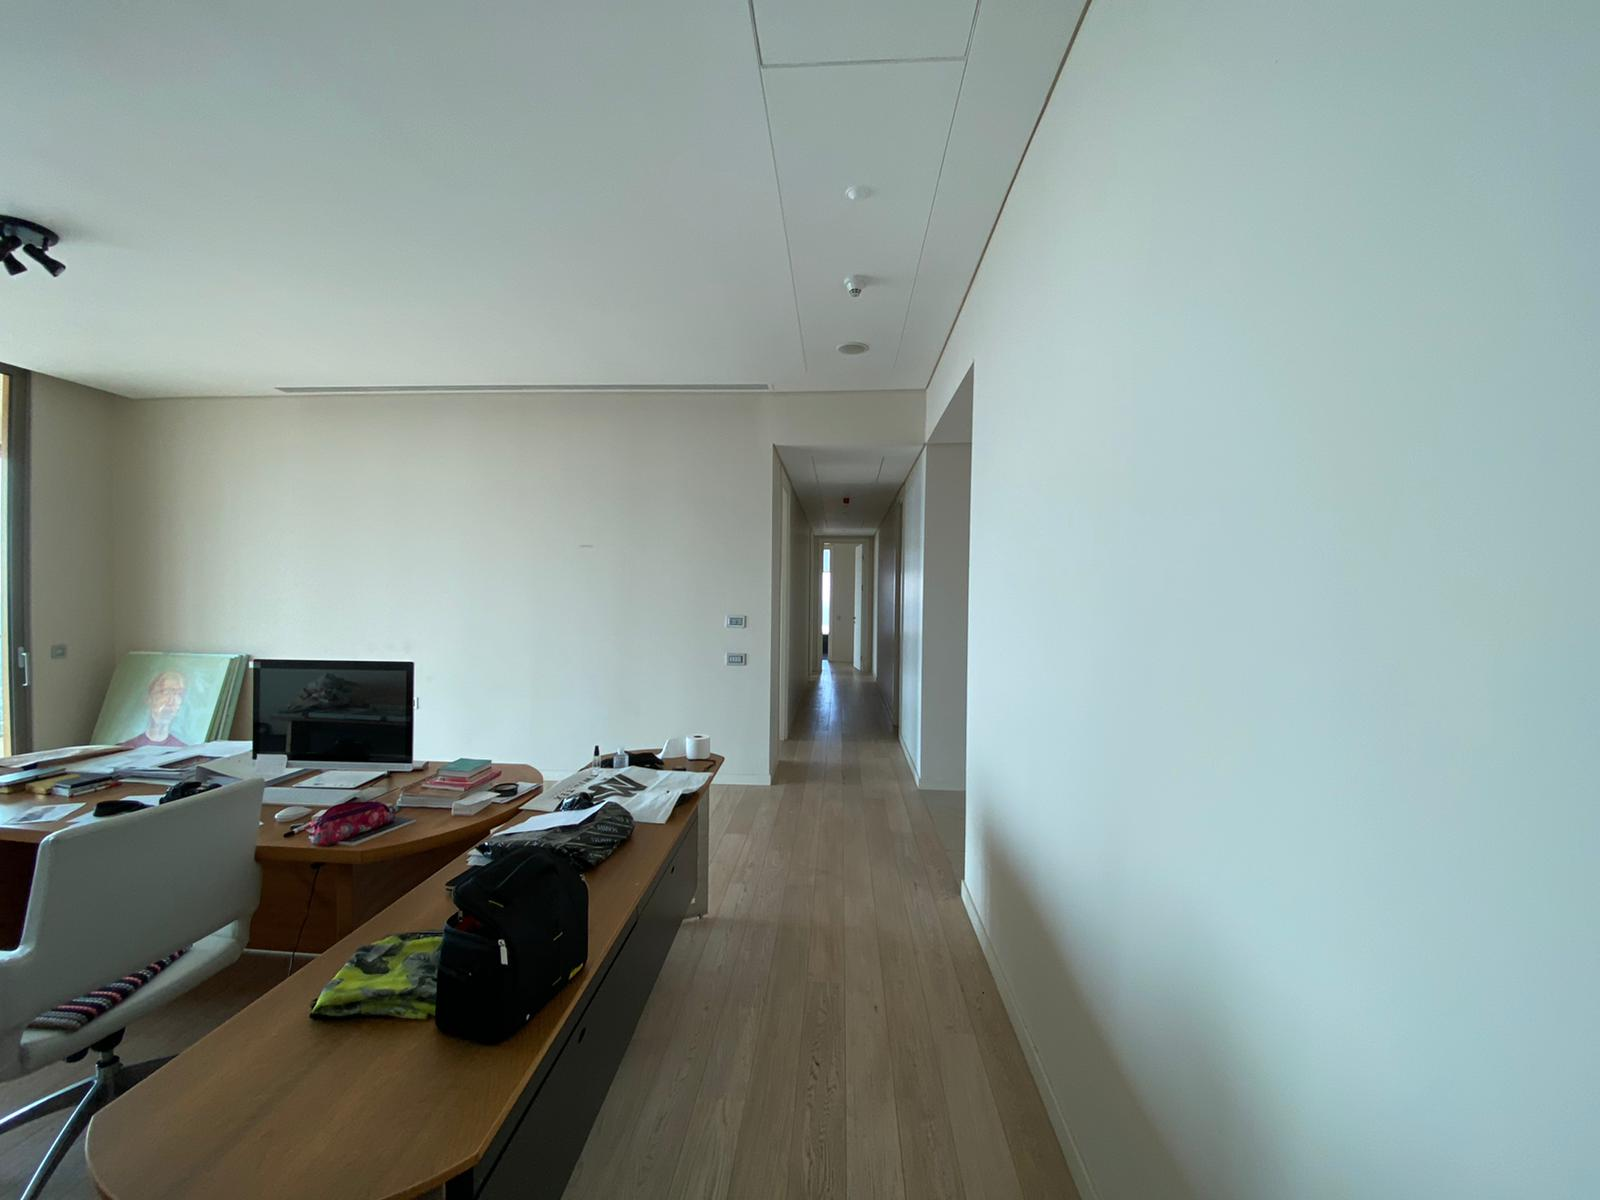 penthouse-istanbul-sapphire-tower-019-1.jpg